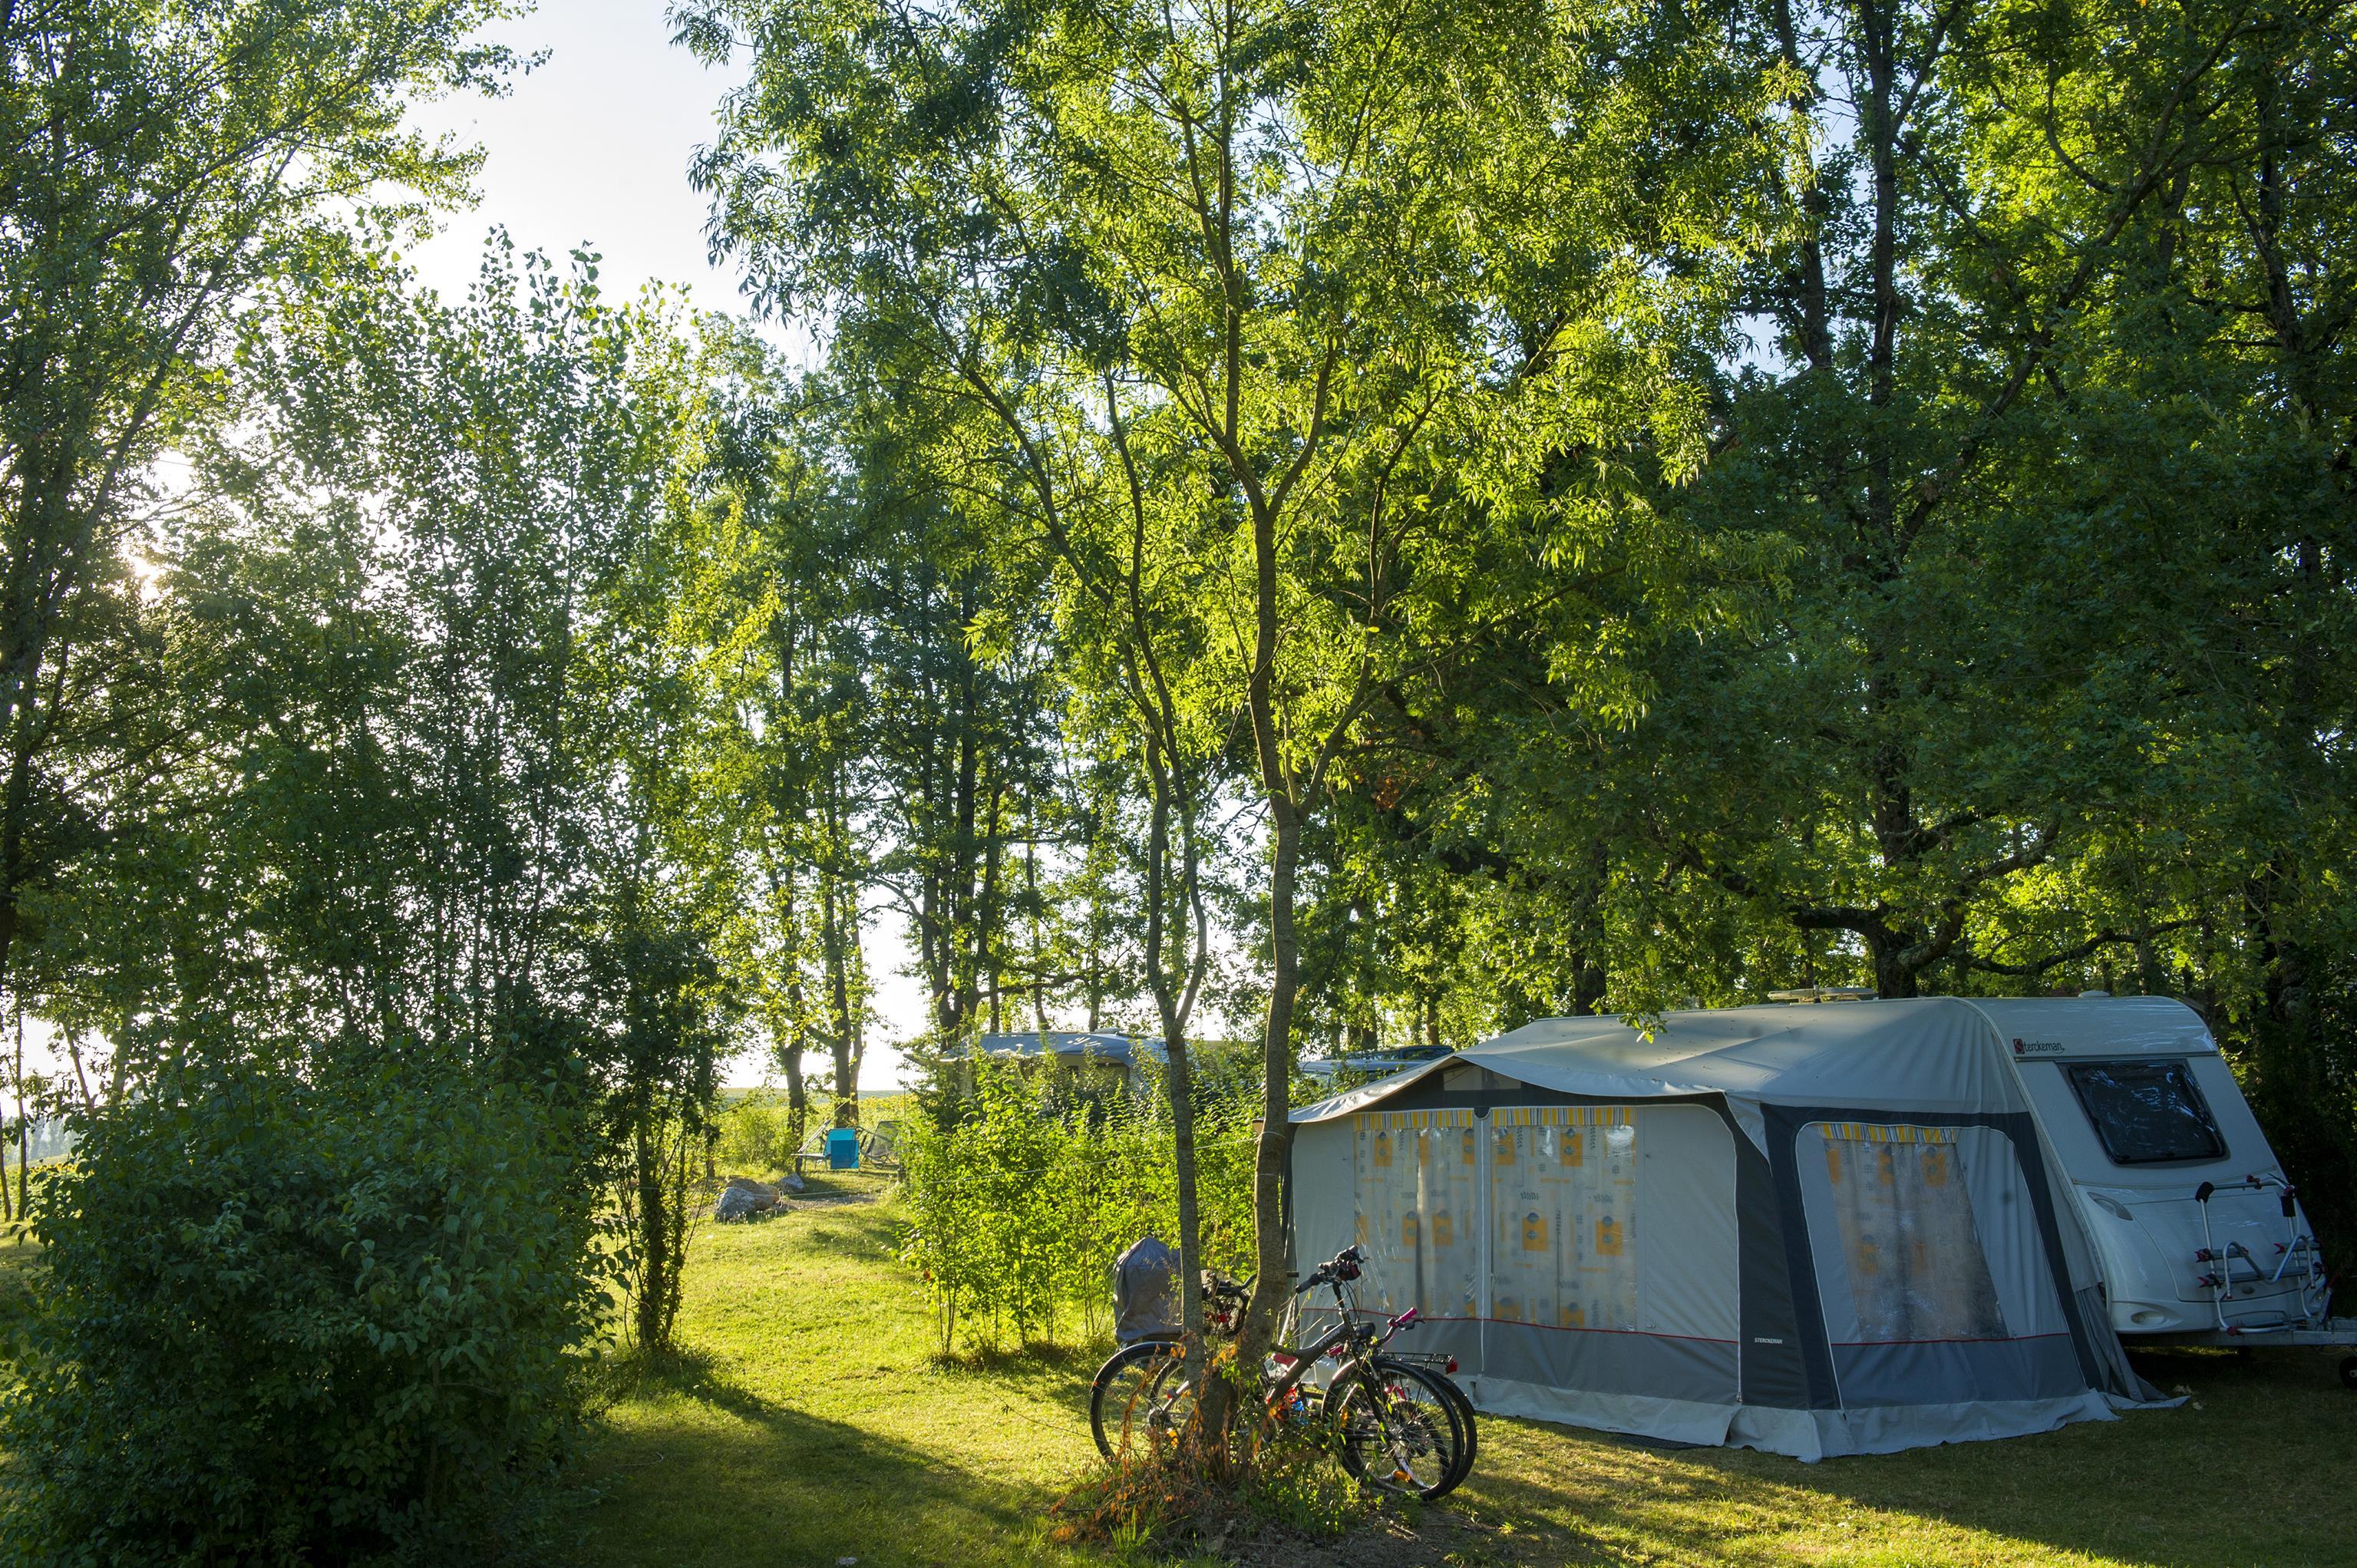 Emplacement - Emplacement Caravane/Camping Car Xl 100/150 M2 10 A - Camping Sites et Paysages Aramis